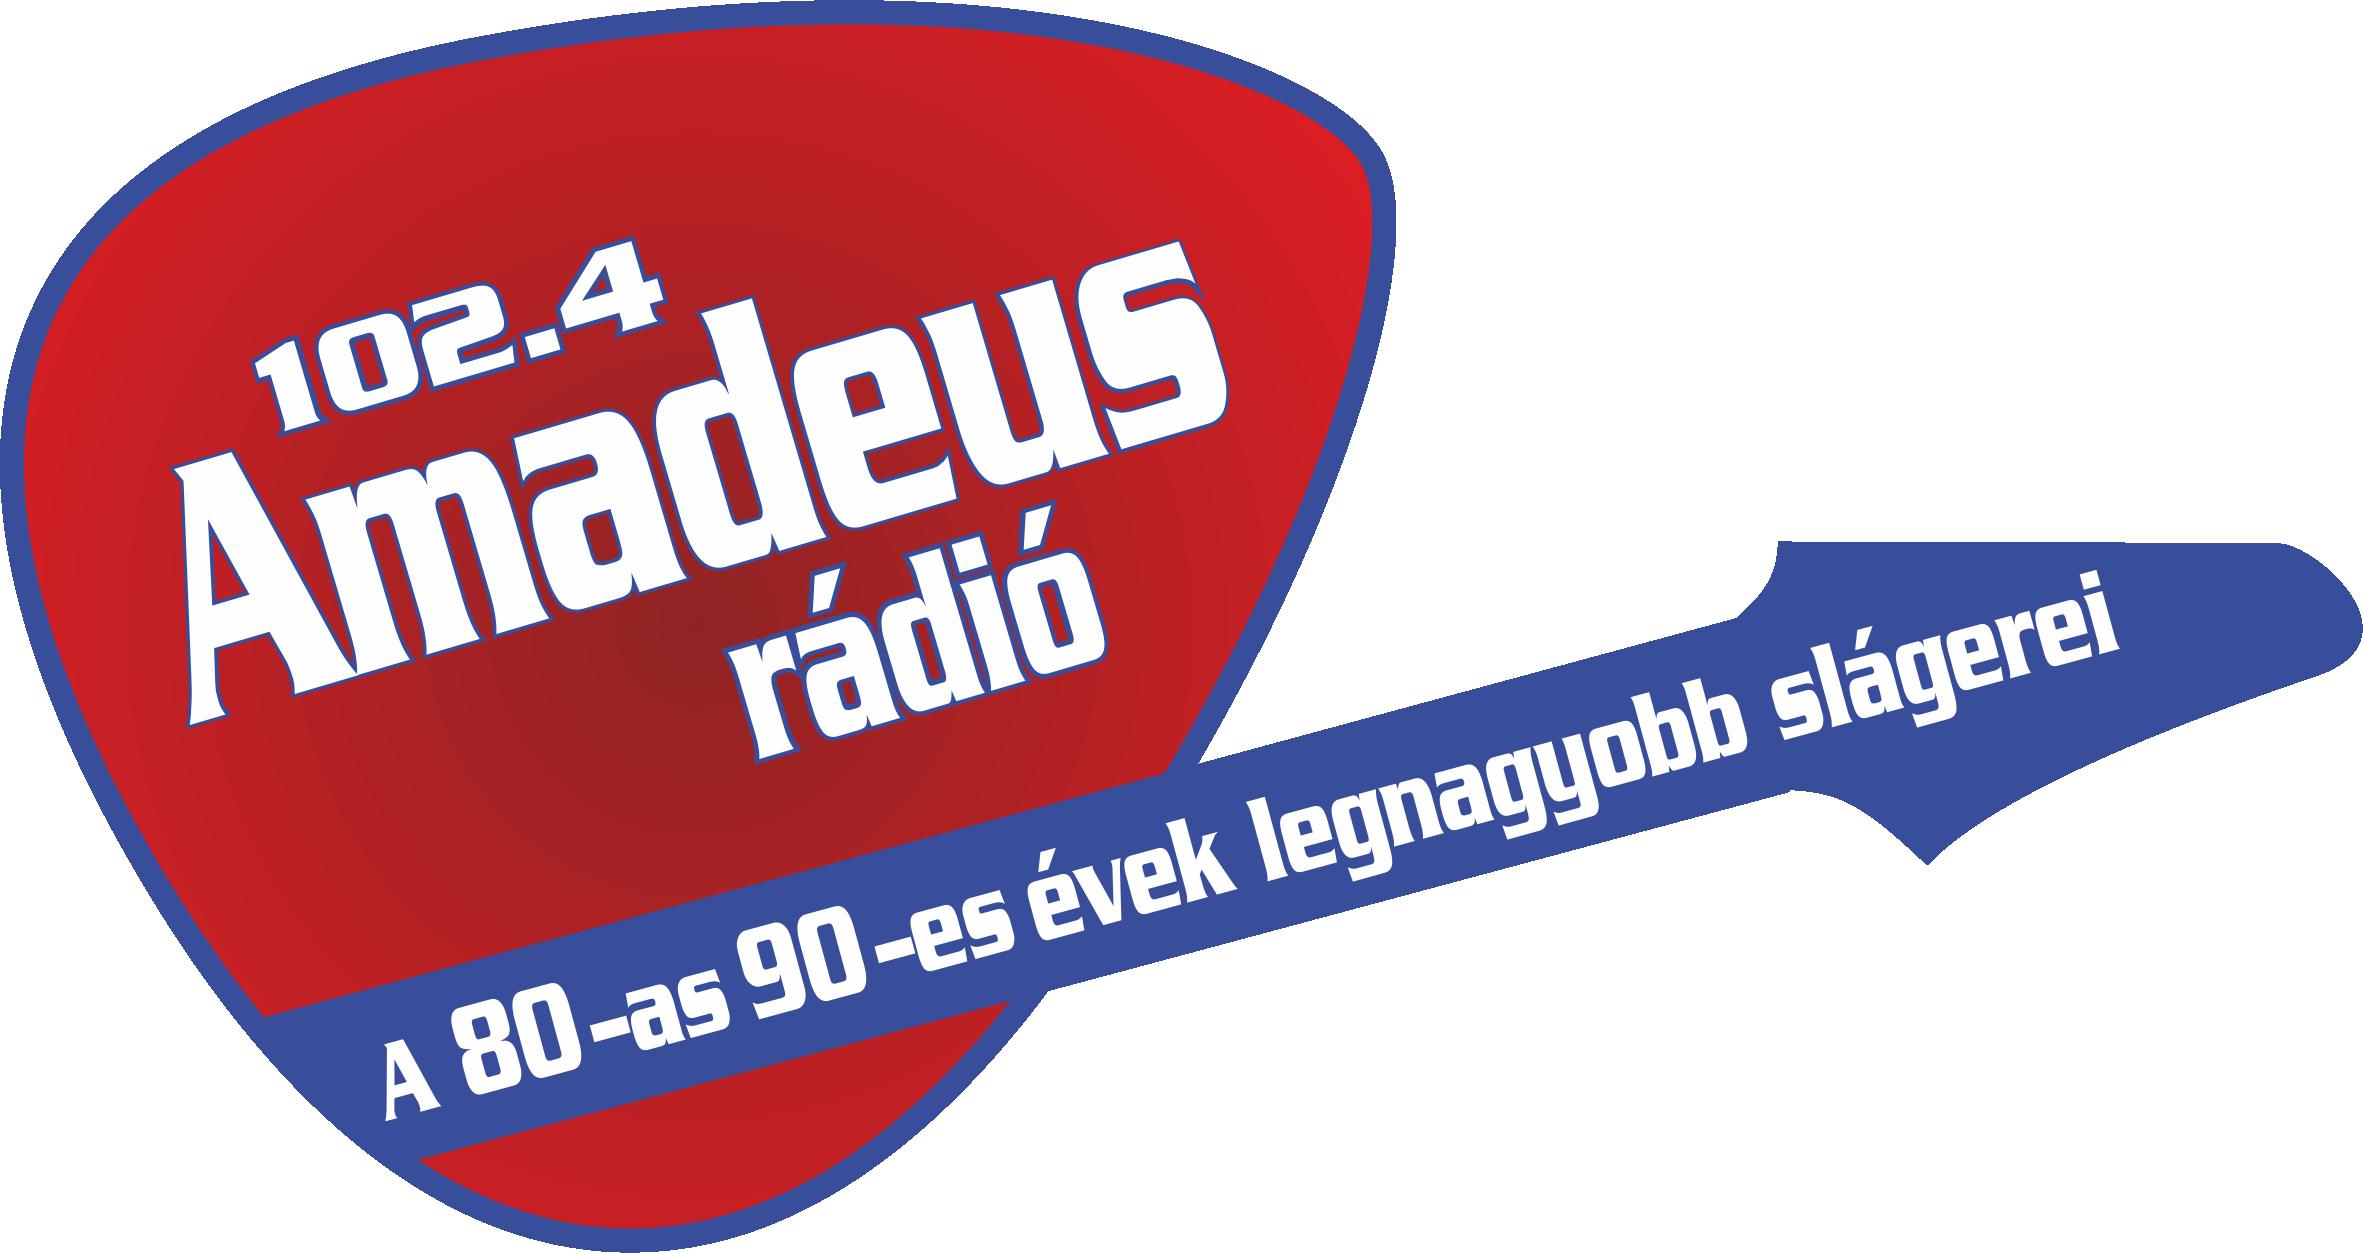 amadeus_logo_vegleges_hatter_nelkuli_raszter_2013_12_18.png